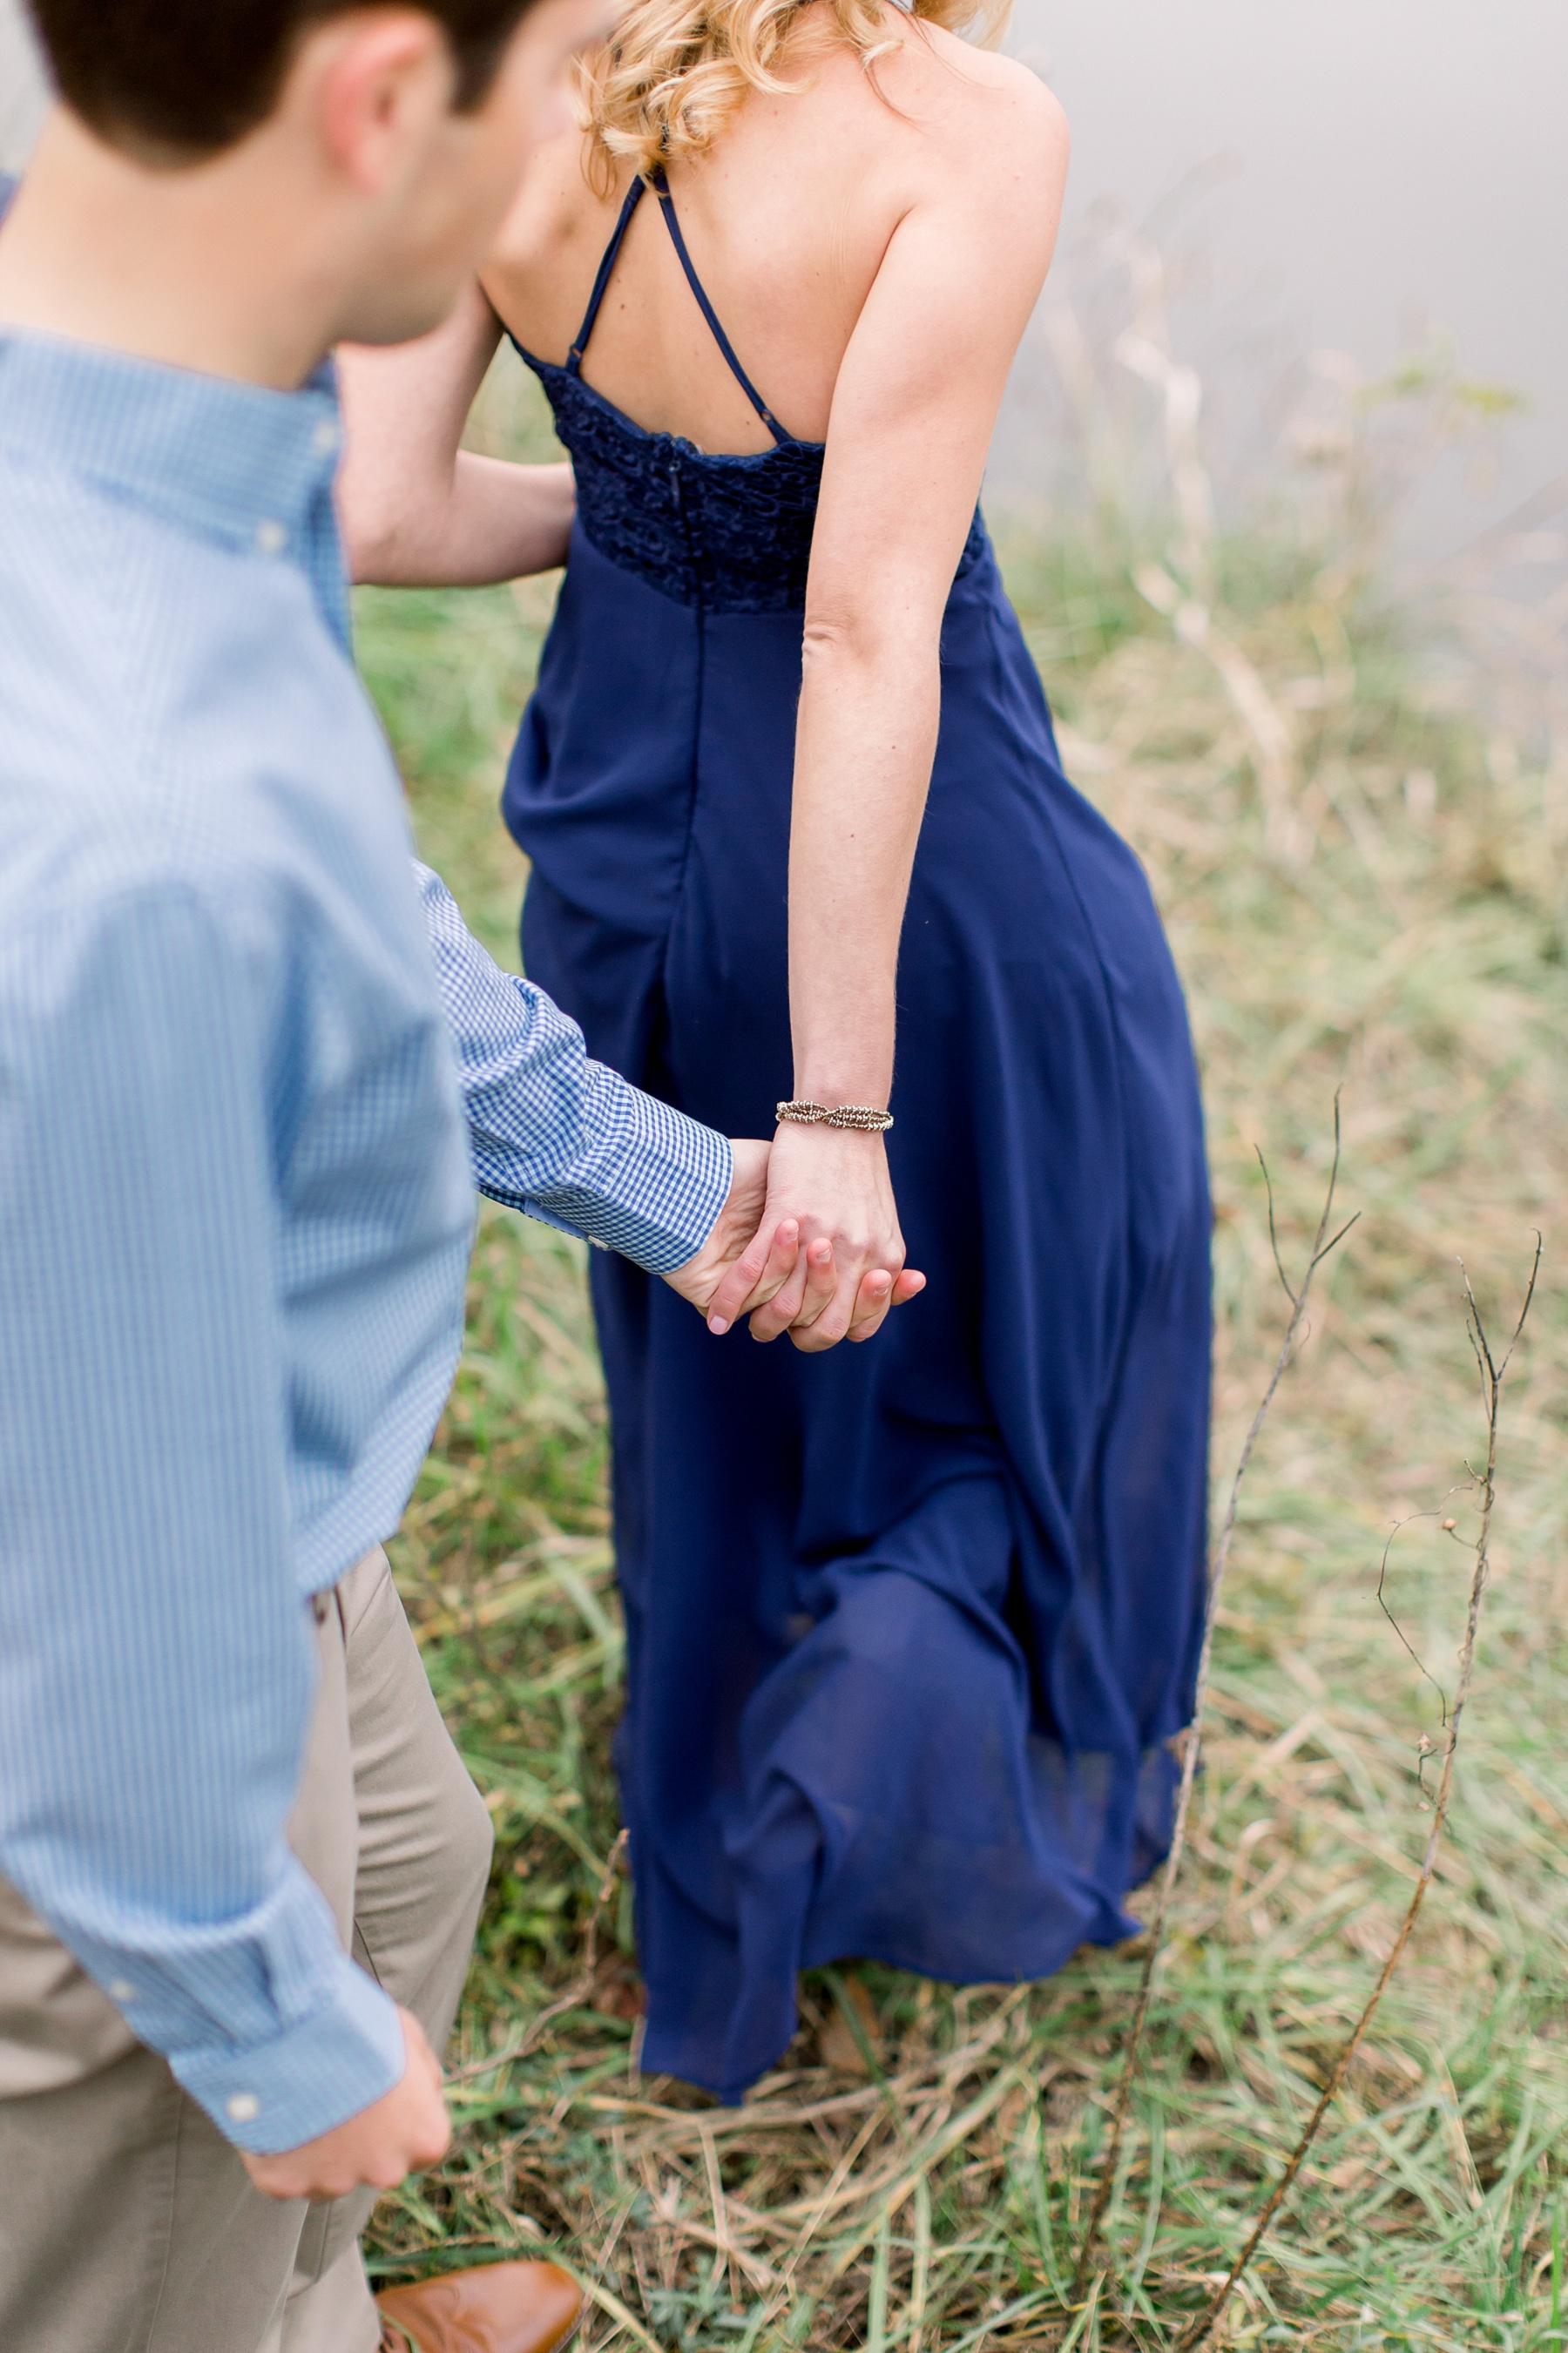 adventurous-authentic-wedding-engagement-photography-kansas-city-elizabeth-ladean-photo_5421.jpg